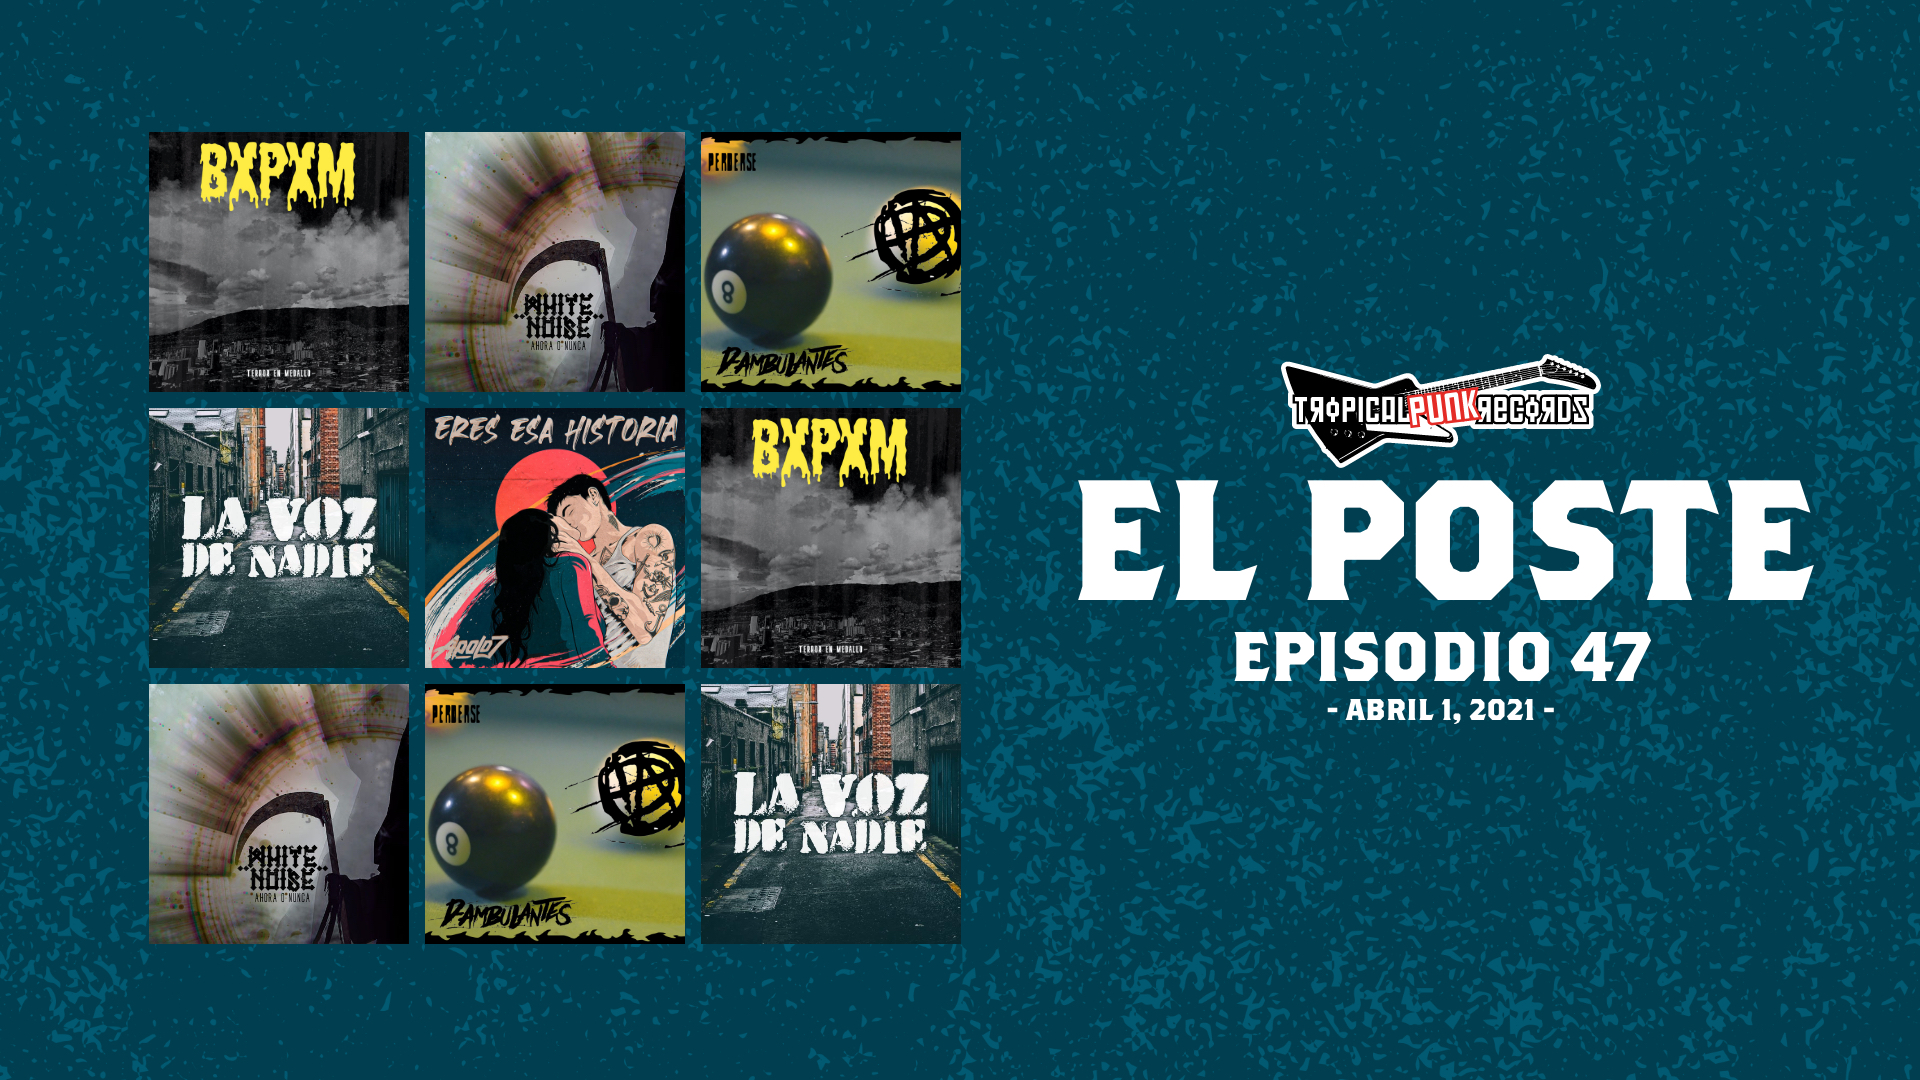 El Poste con Bombasxminuto, White Noise, Apolo 7, D-Ambulantes y La Voz de Nadie | Episodio 47 | Tropical Punk Records